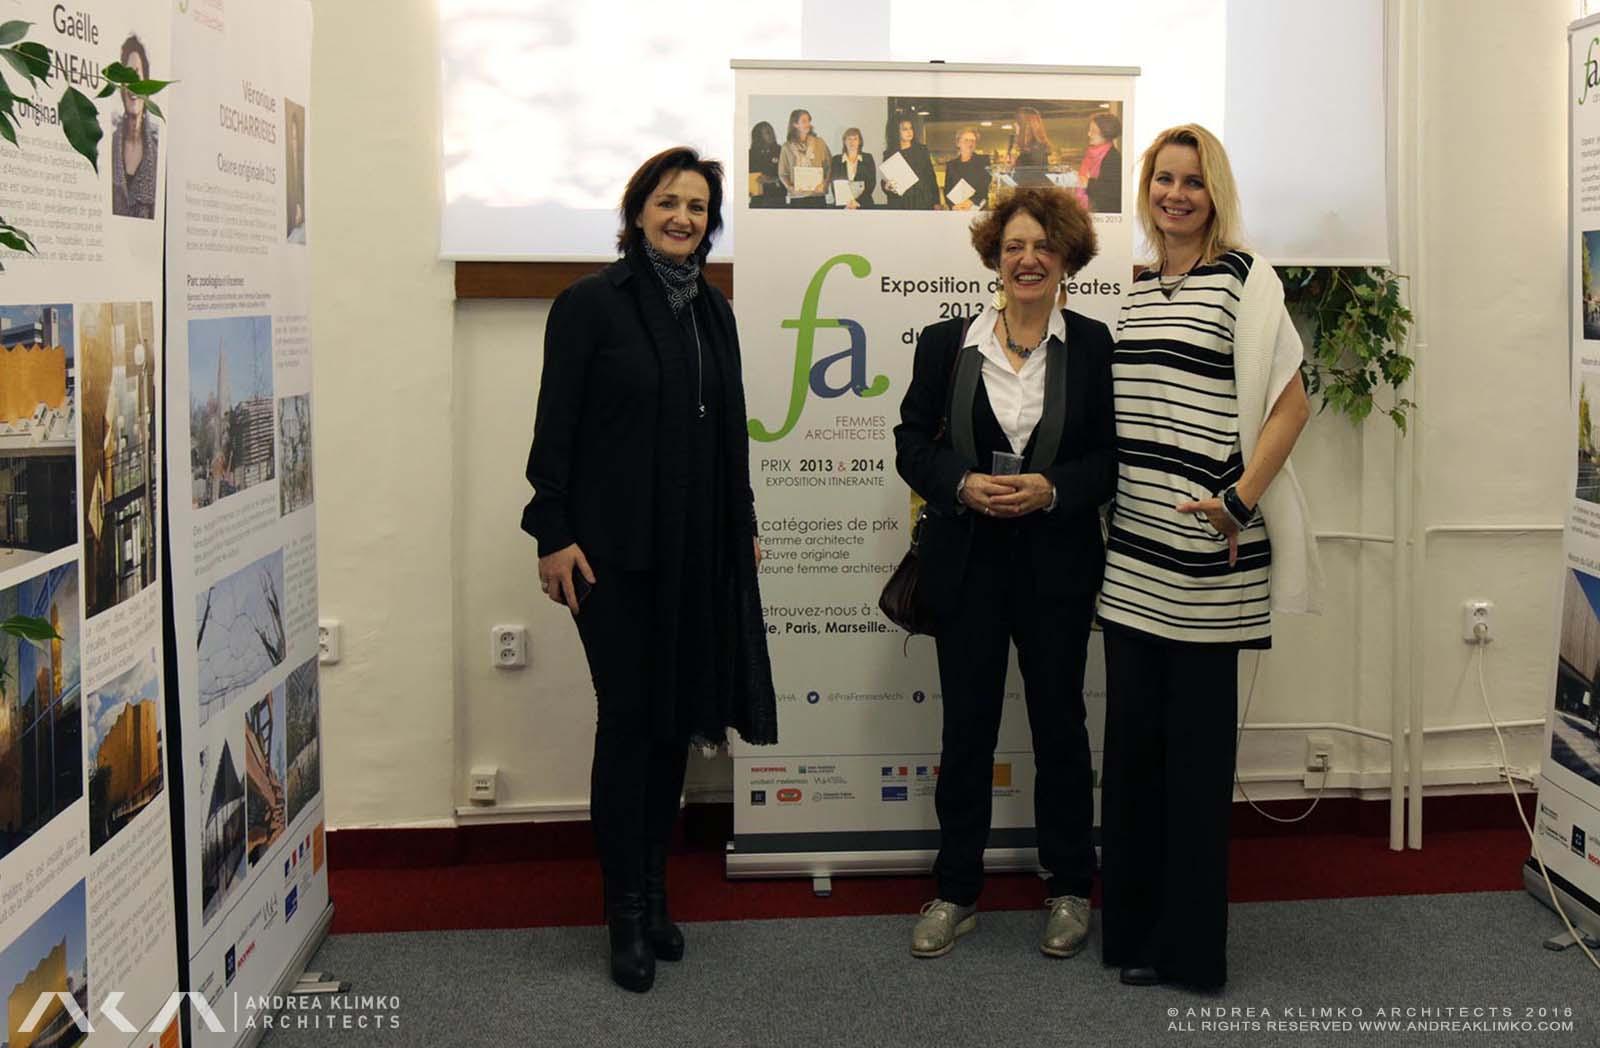 prix-des-femmes-architectes-on-display-in-bratislava_02